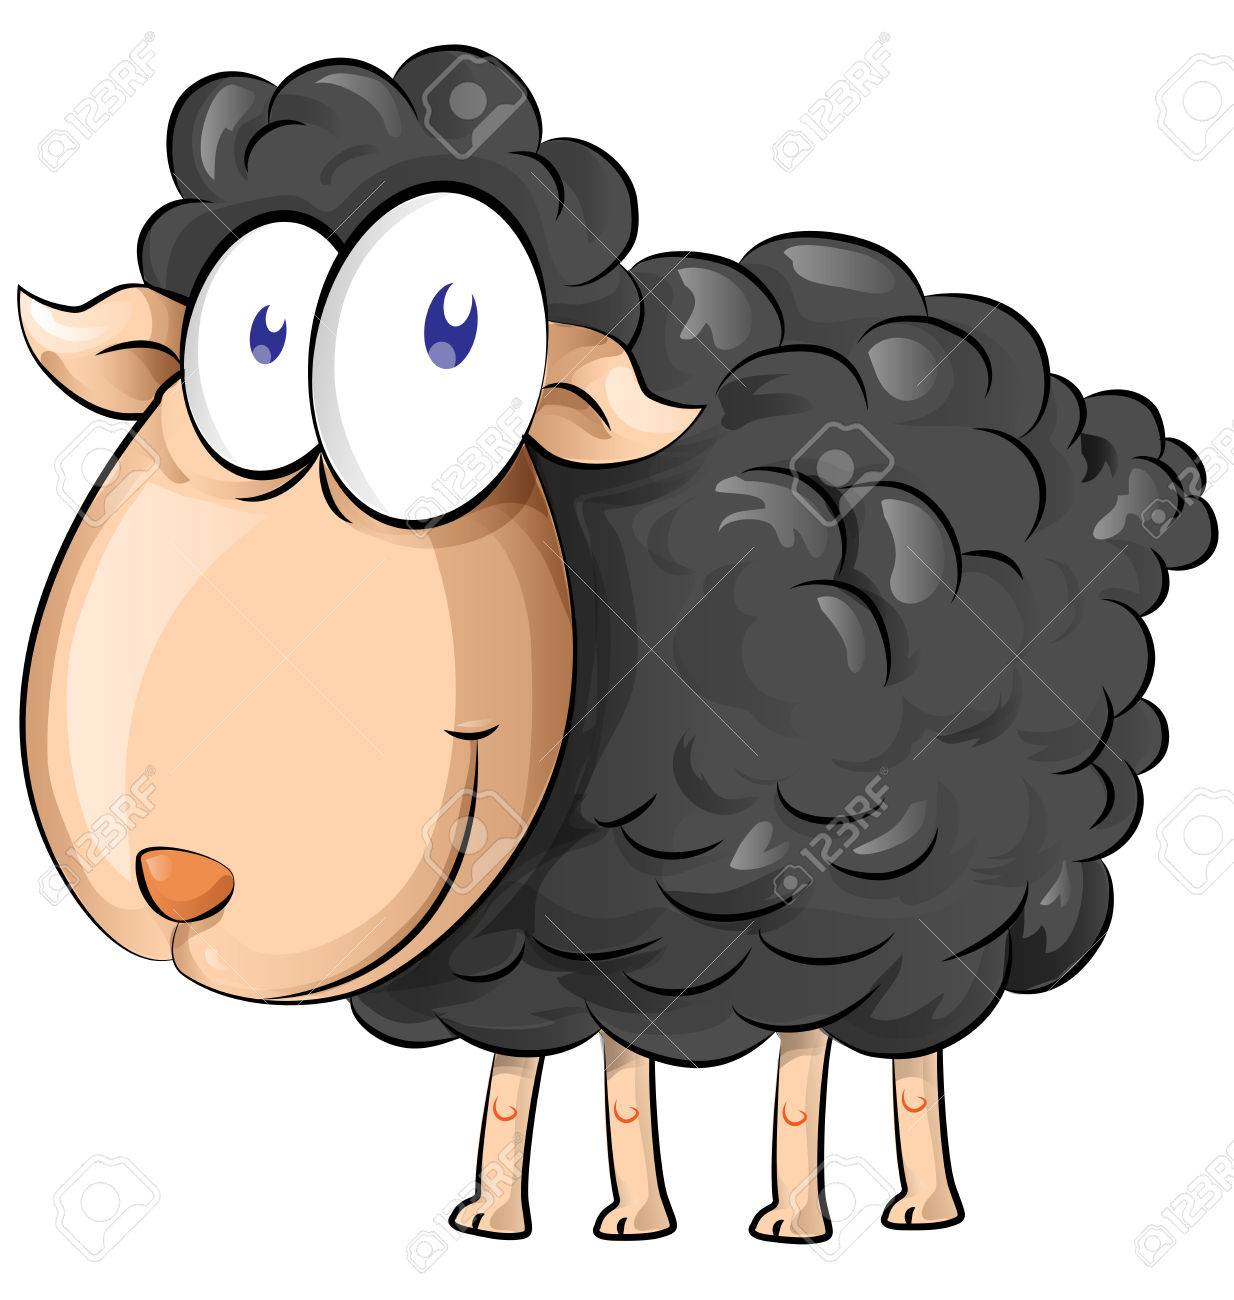 black sheep cartoon isolate on white background royalty free rh 123rf com black sheep clip art free black sheep clipart graphics